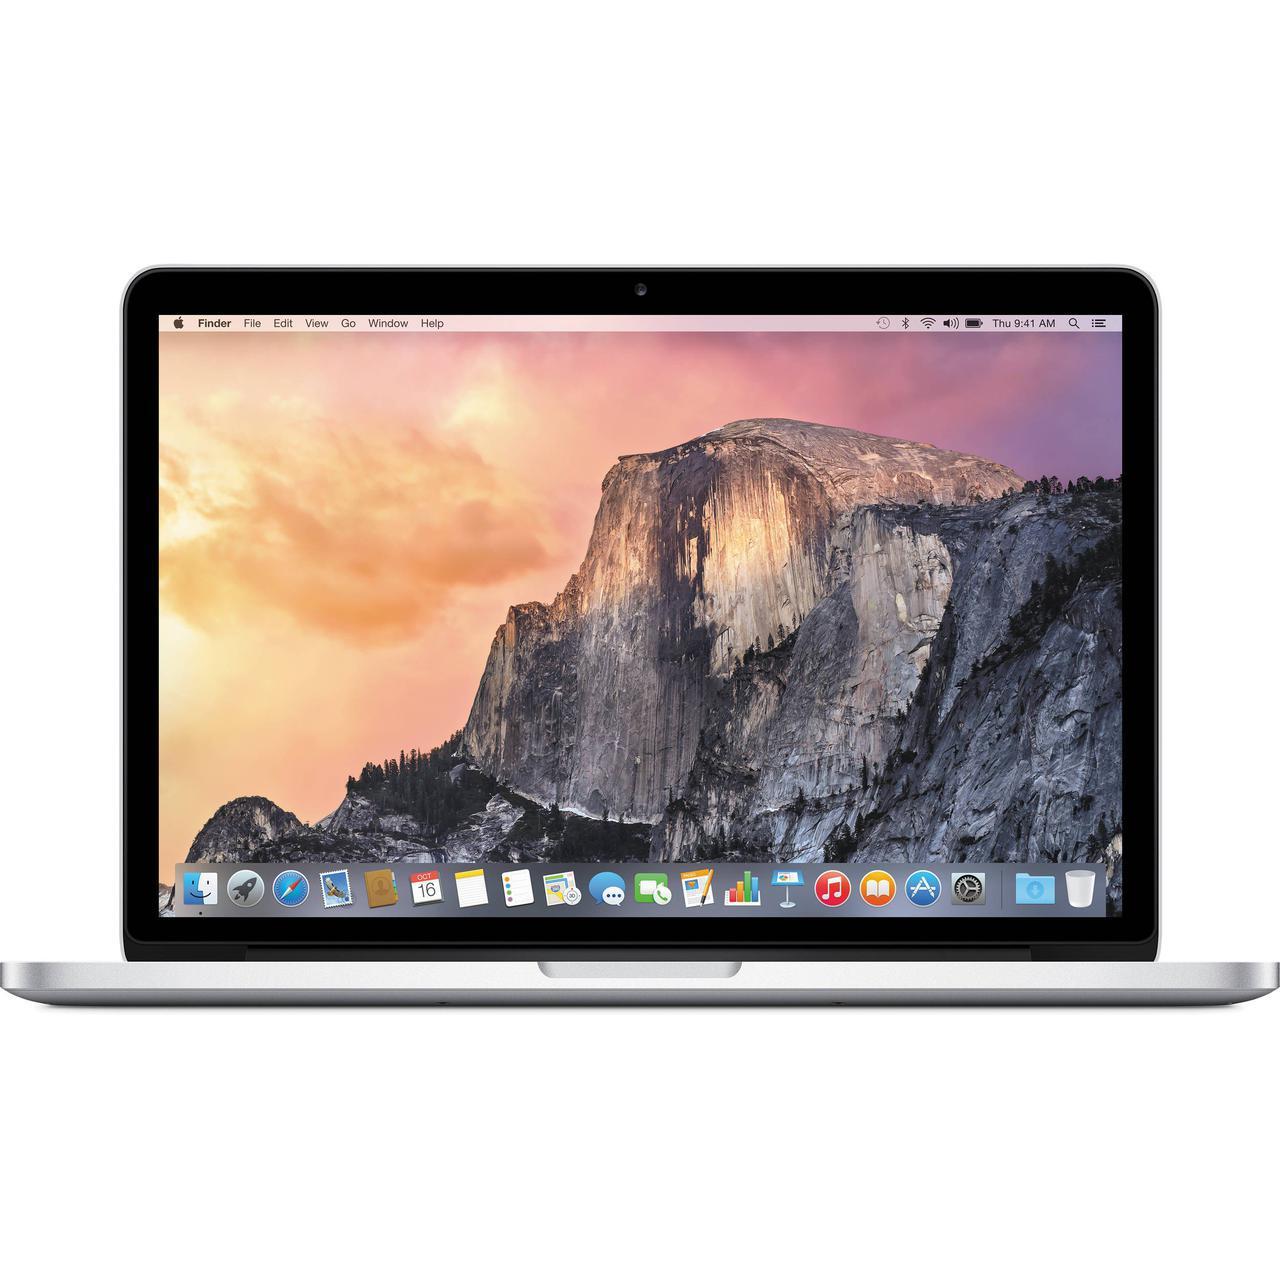 "Apple MacBook Pro 15"" 512 Gb Touch Bar Space Gray (MPTT2) 2017"